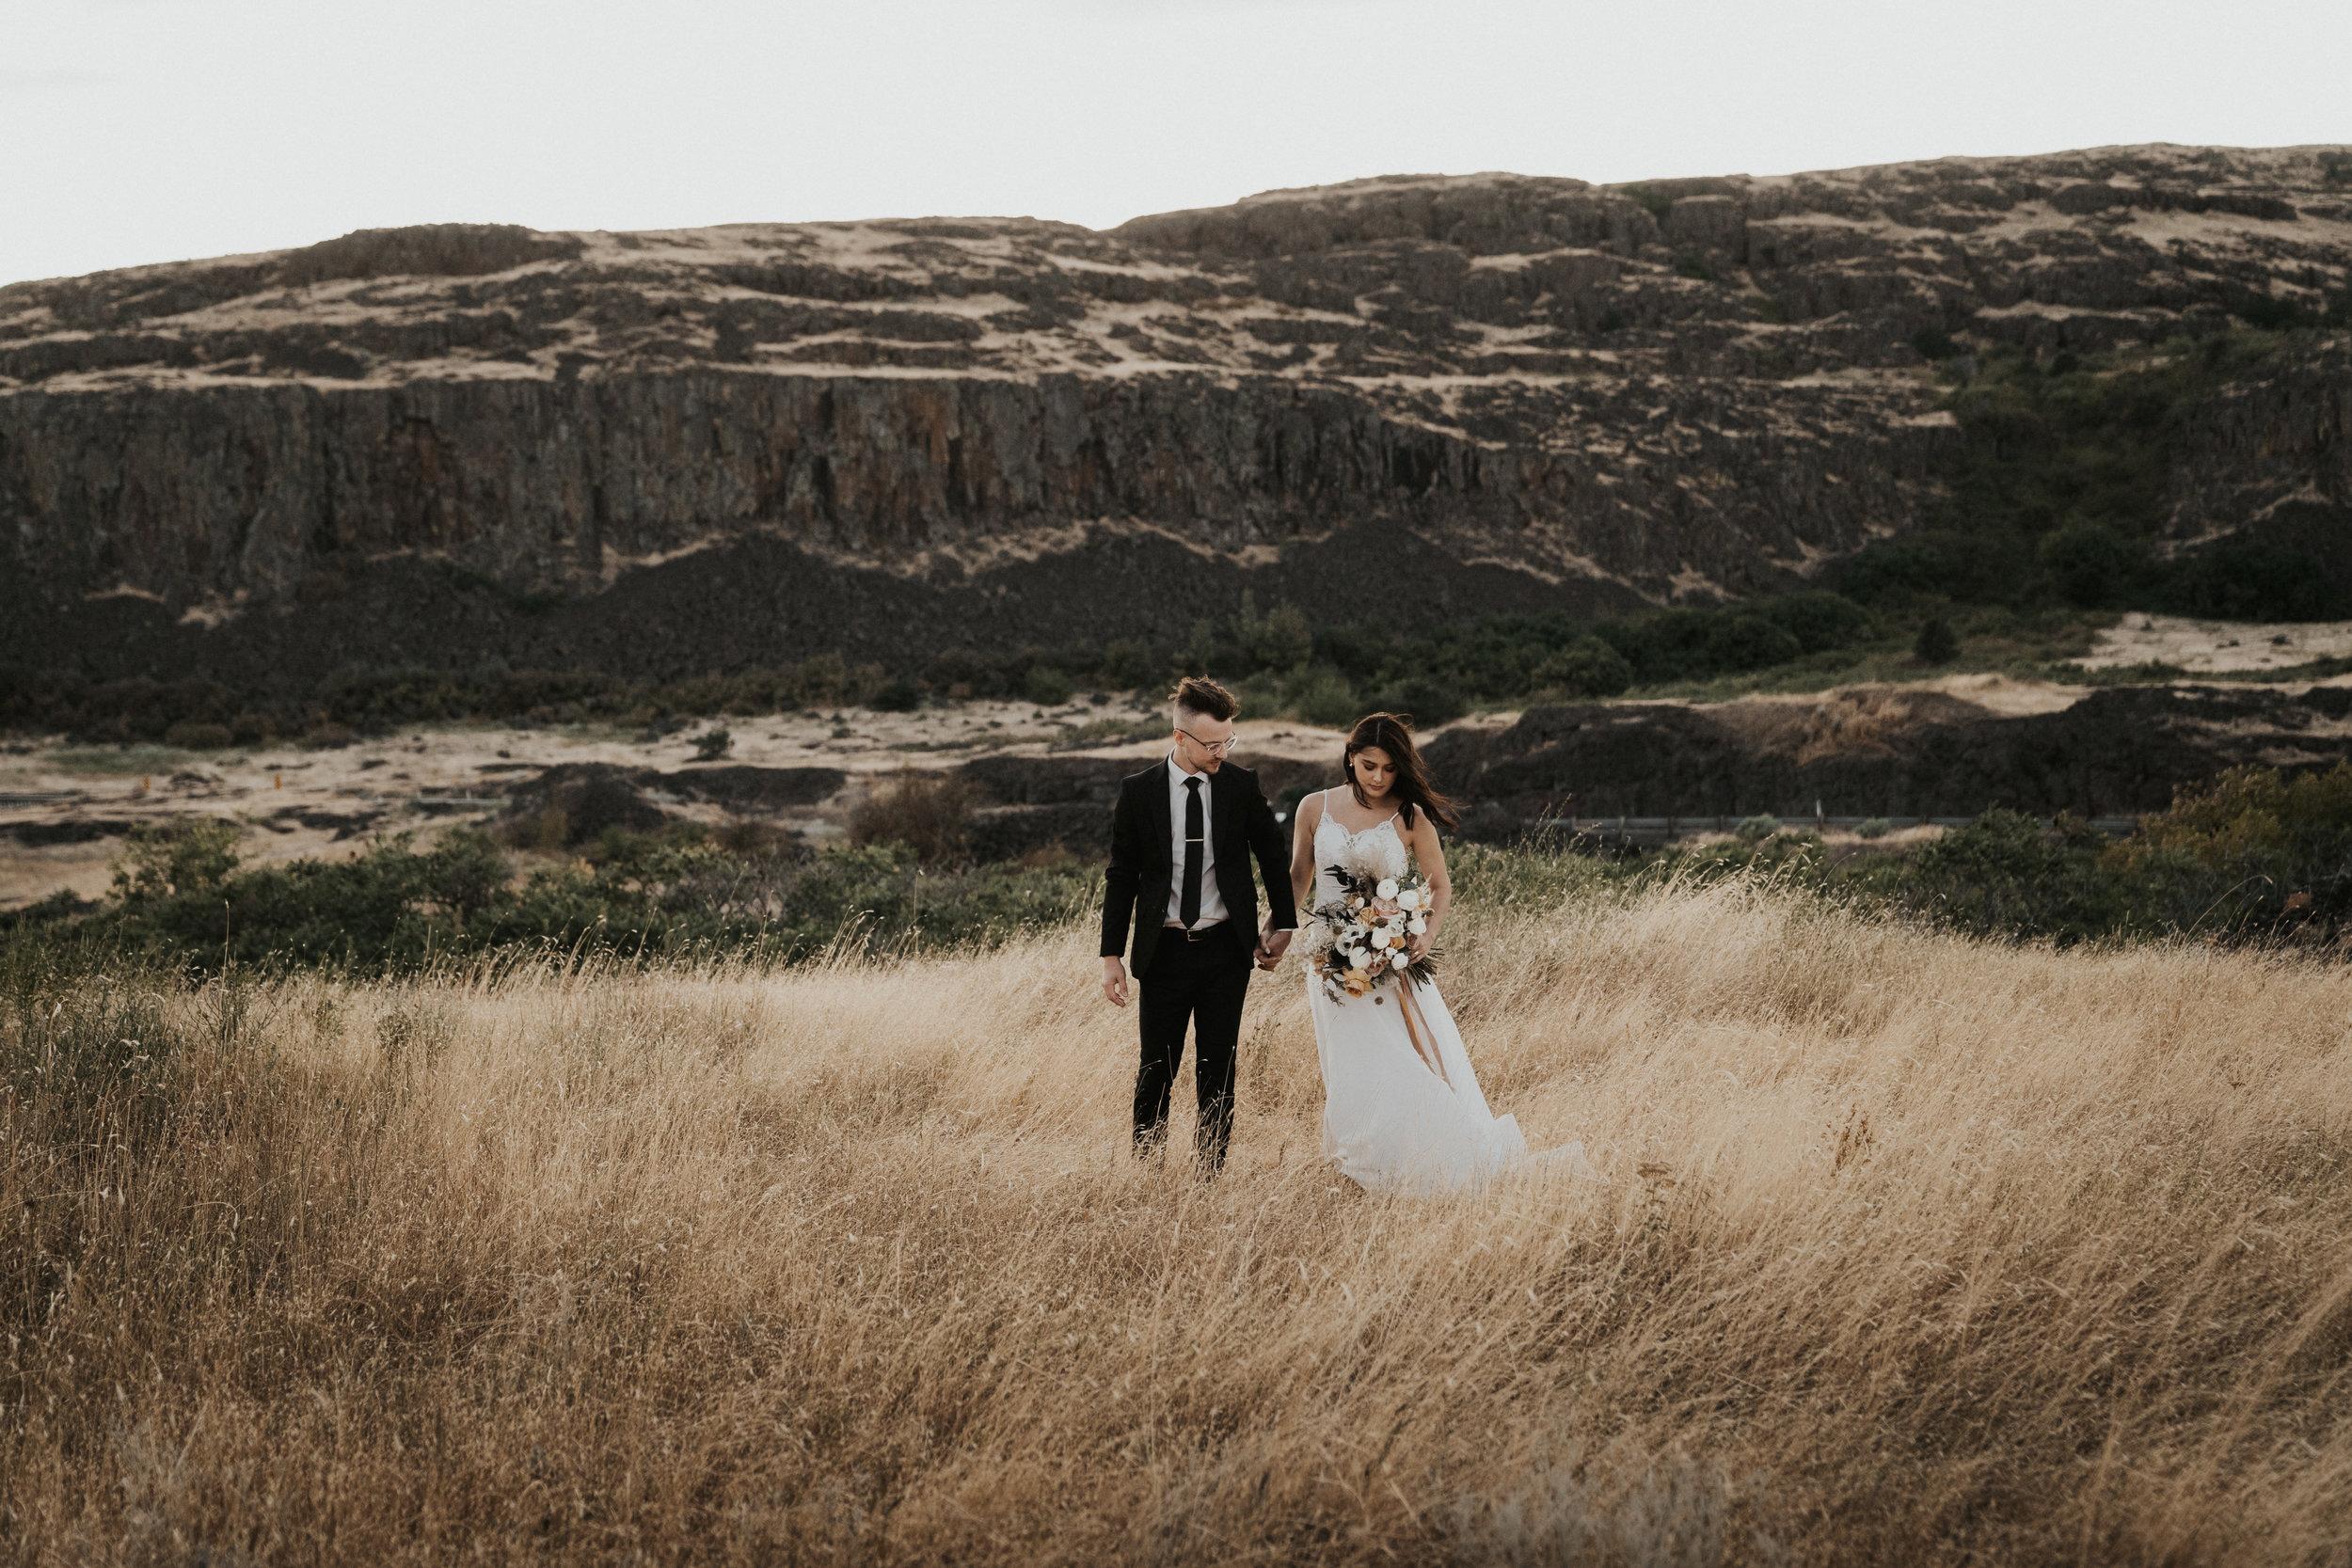 columbia-river-gorge-wedding-elopement-inspiration-10.jpg